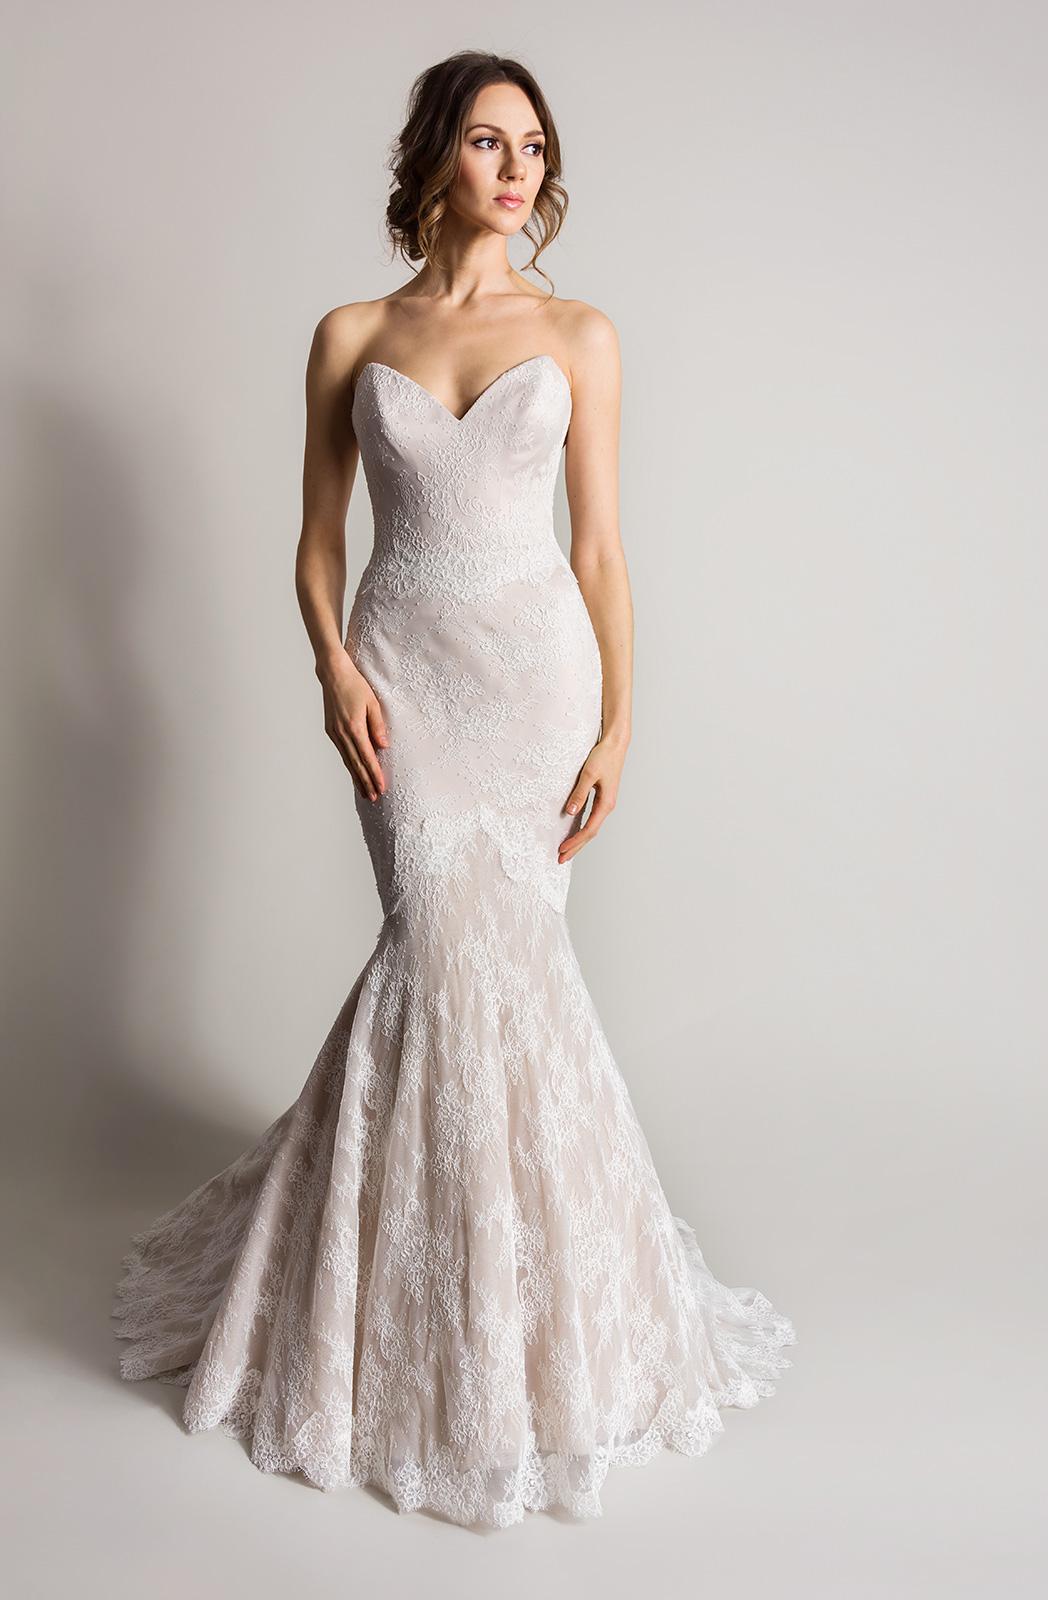 Wedding Dress Sample Sale | Ex Display Off The Peg Wedding Gowns